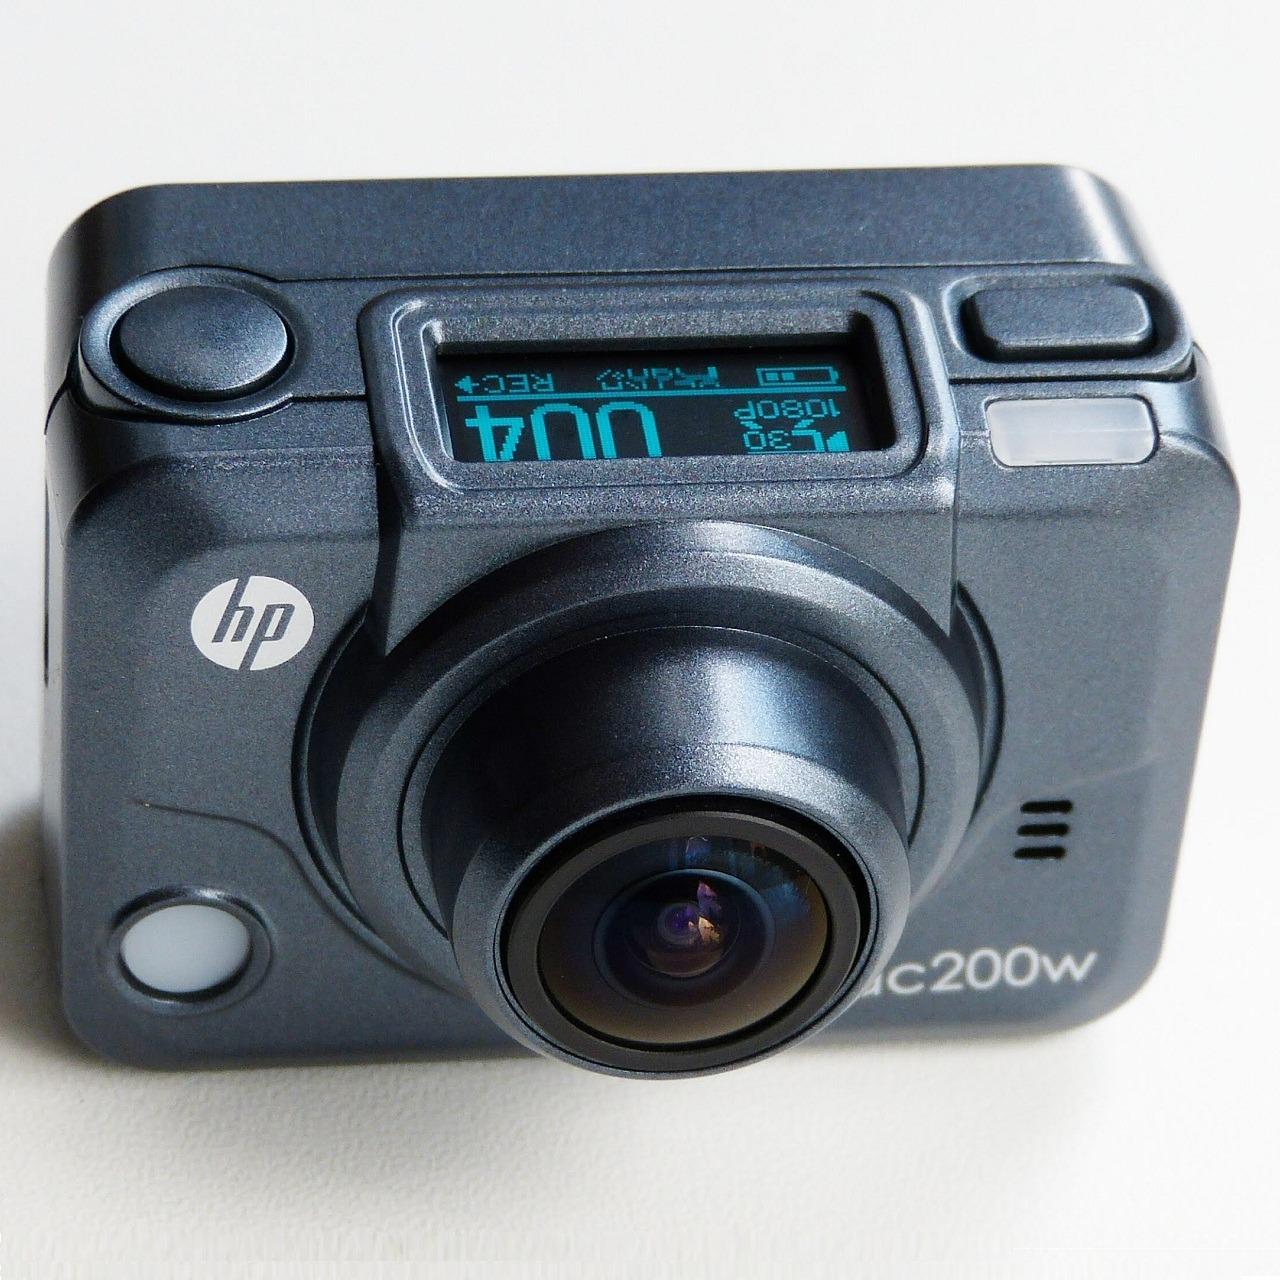 Экшен камера HP ac200w